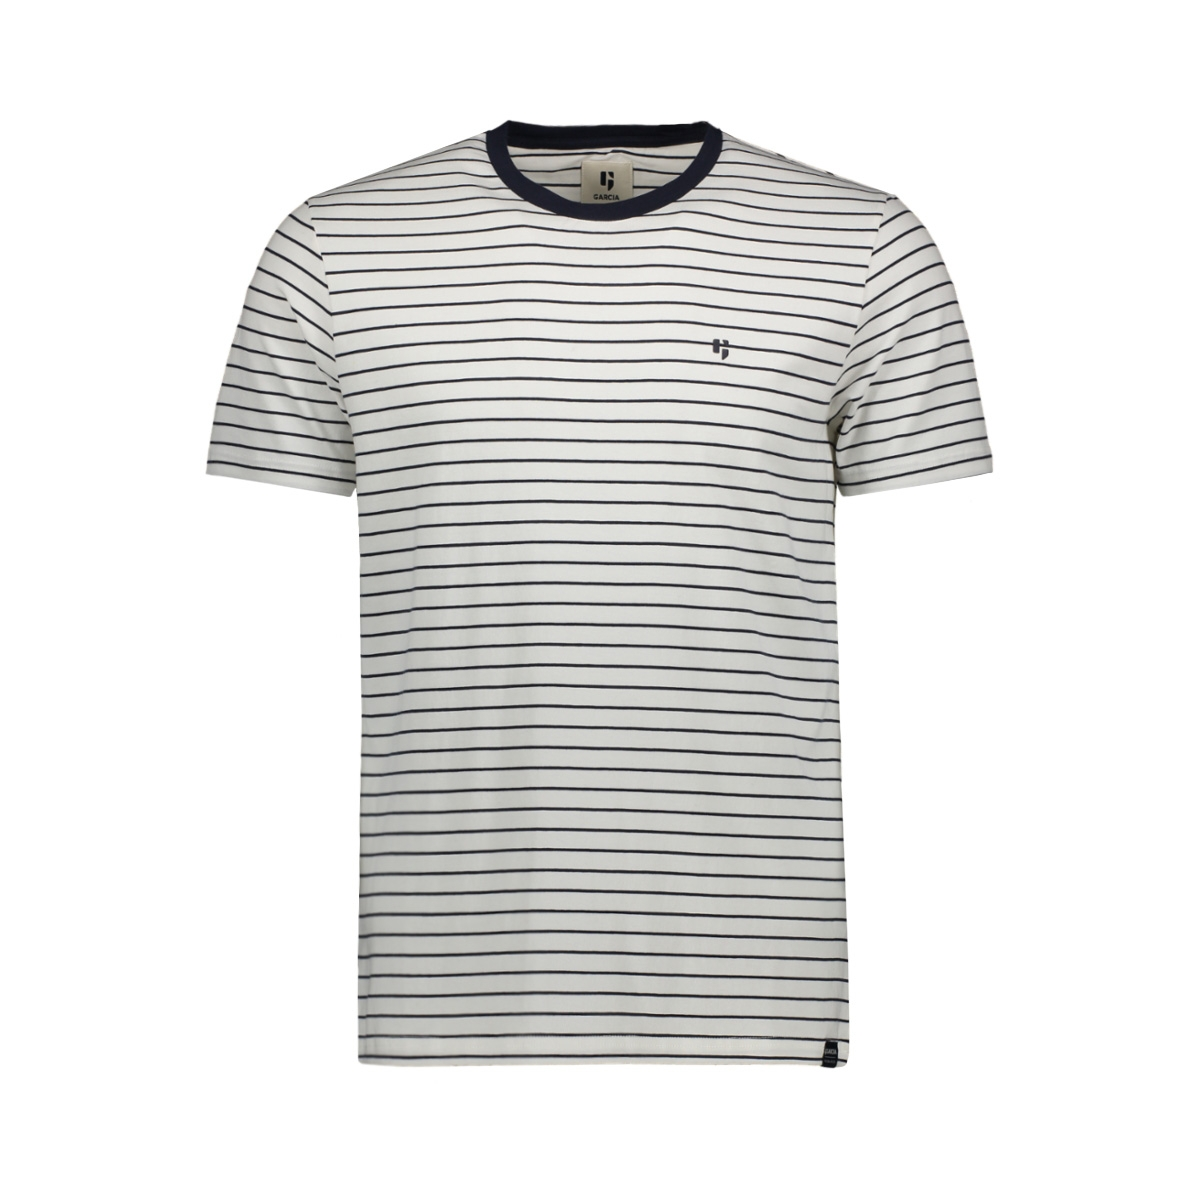 t shirt met streep gs010102 garcia t-shirt 292 dark moon